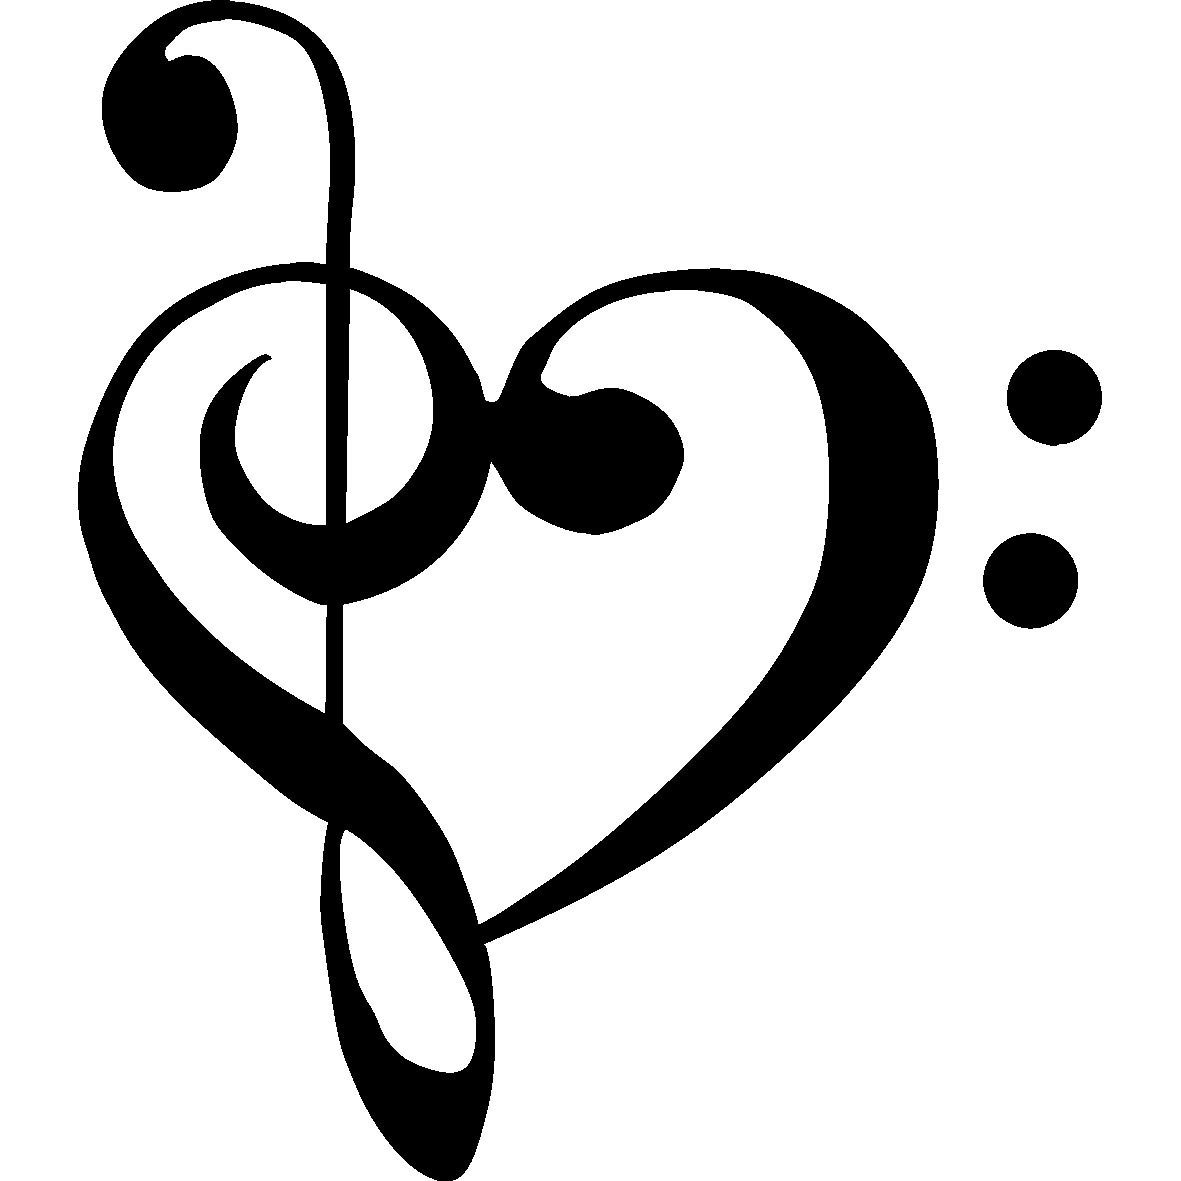 Treble clef symbol text images treble clef symbol text g clef symbol text gold treble buycottarizona